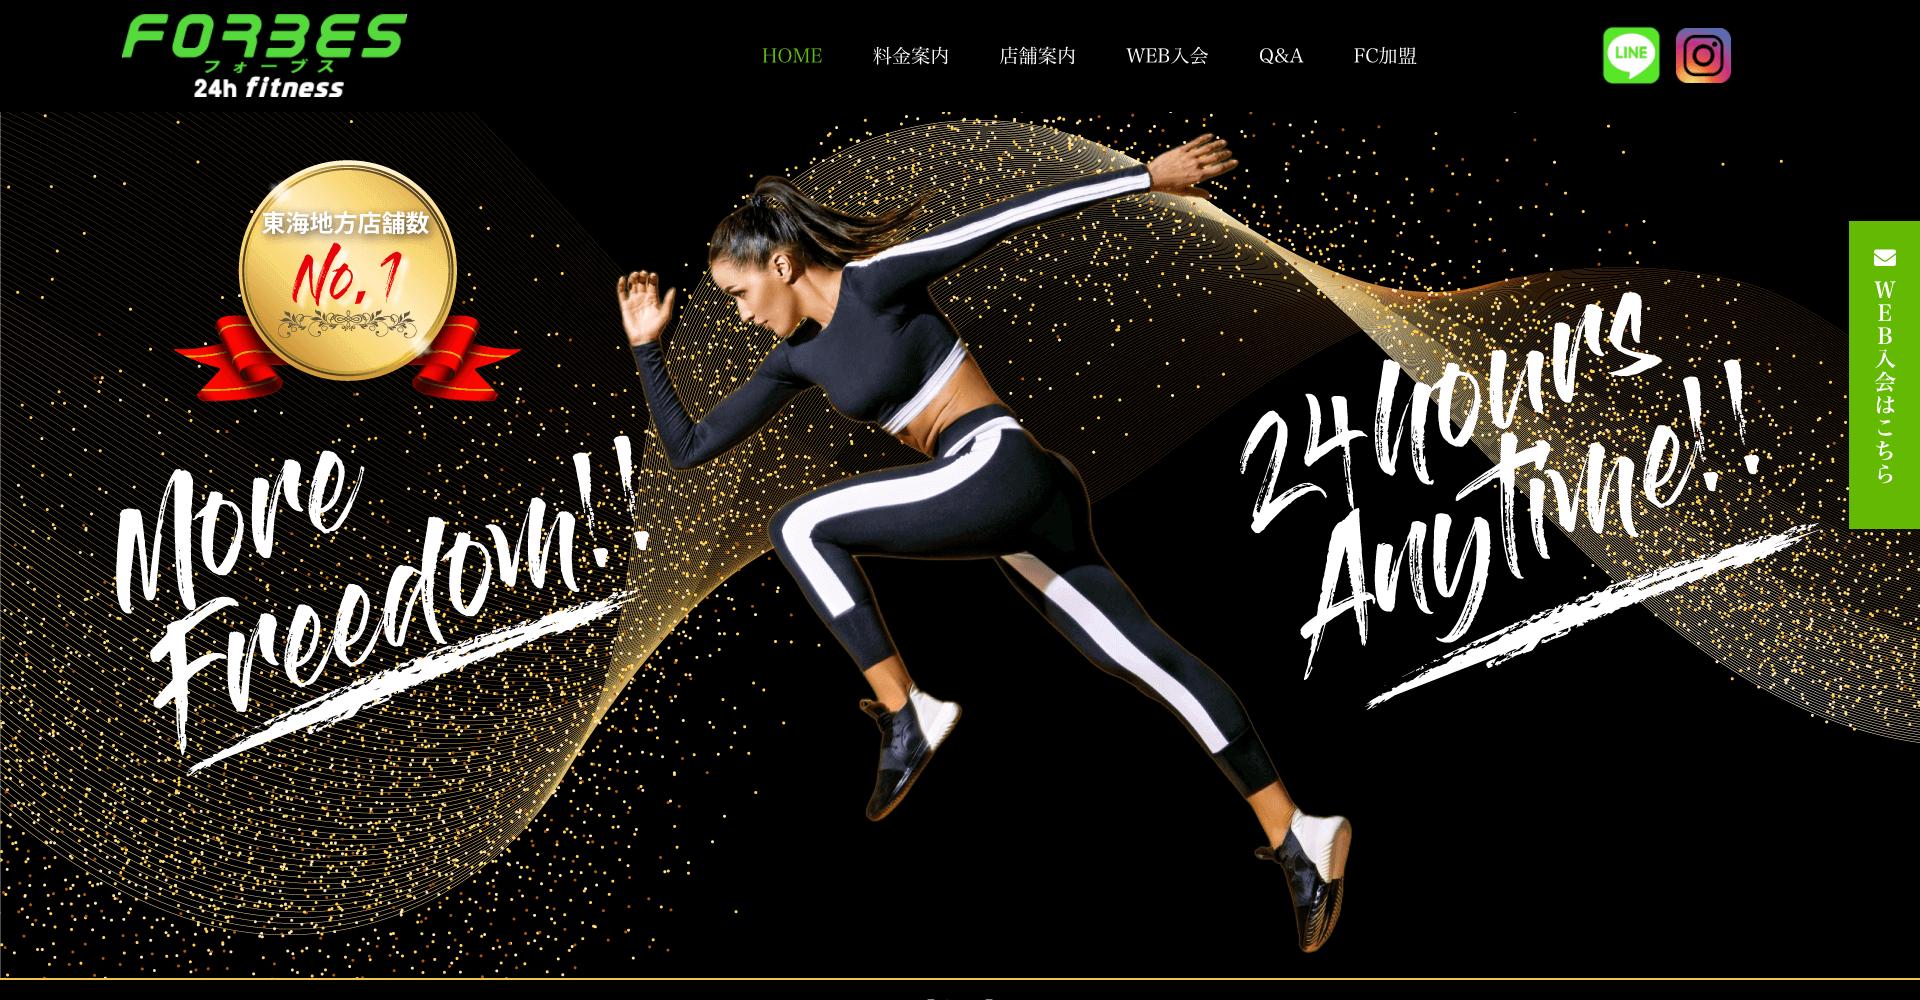 FORBES 24h fitness 刈谷ハイウェイオアシス前店